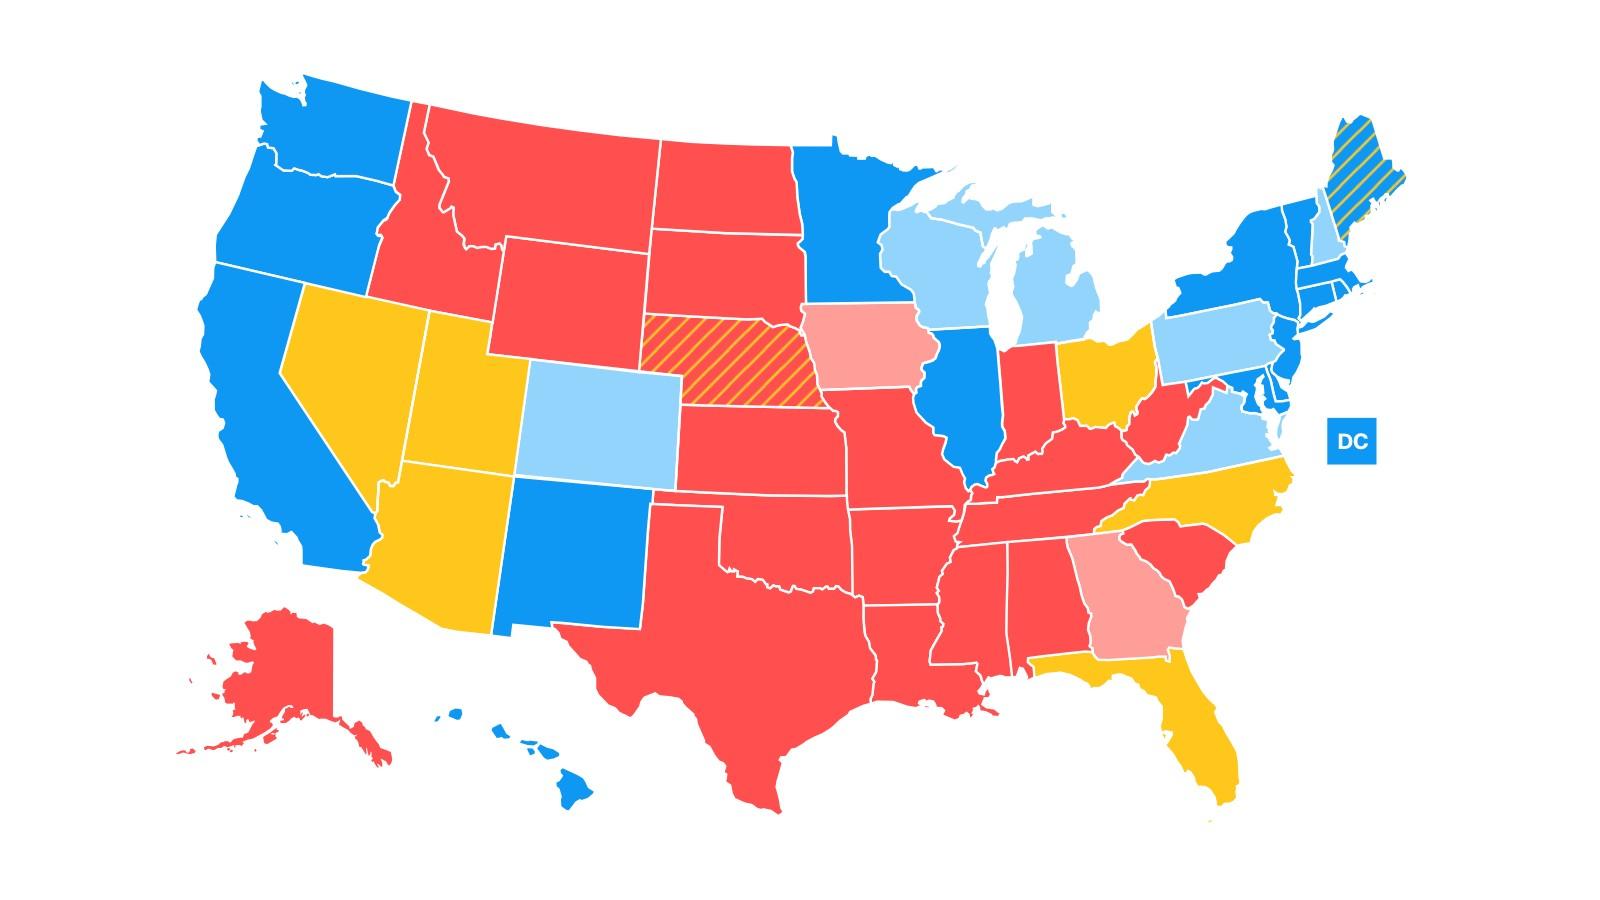 Early Voting Update More Than 12 6 Million Votes Cast Cnnpolitics